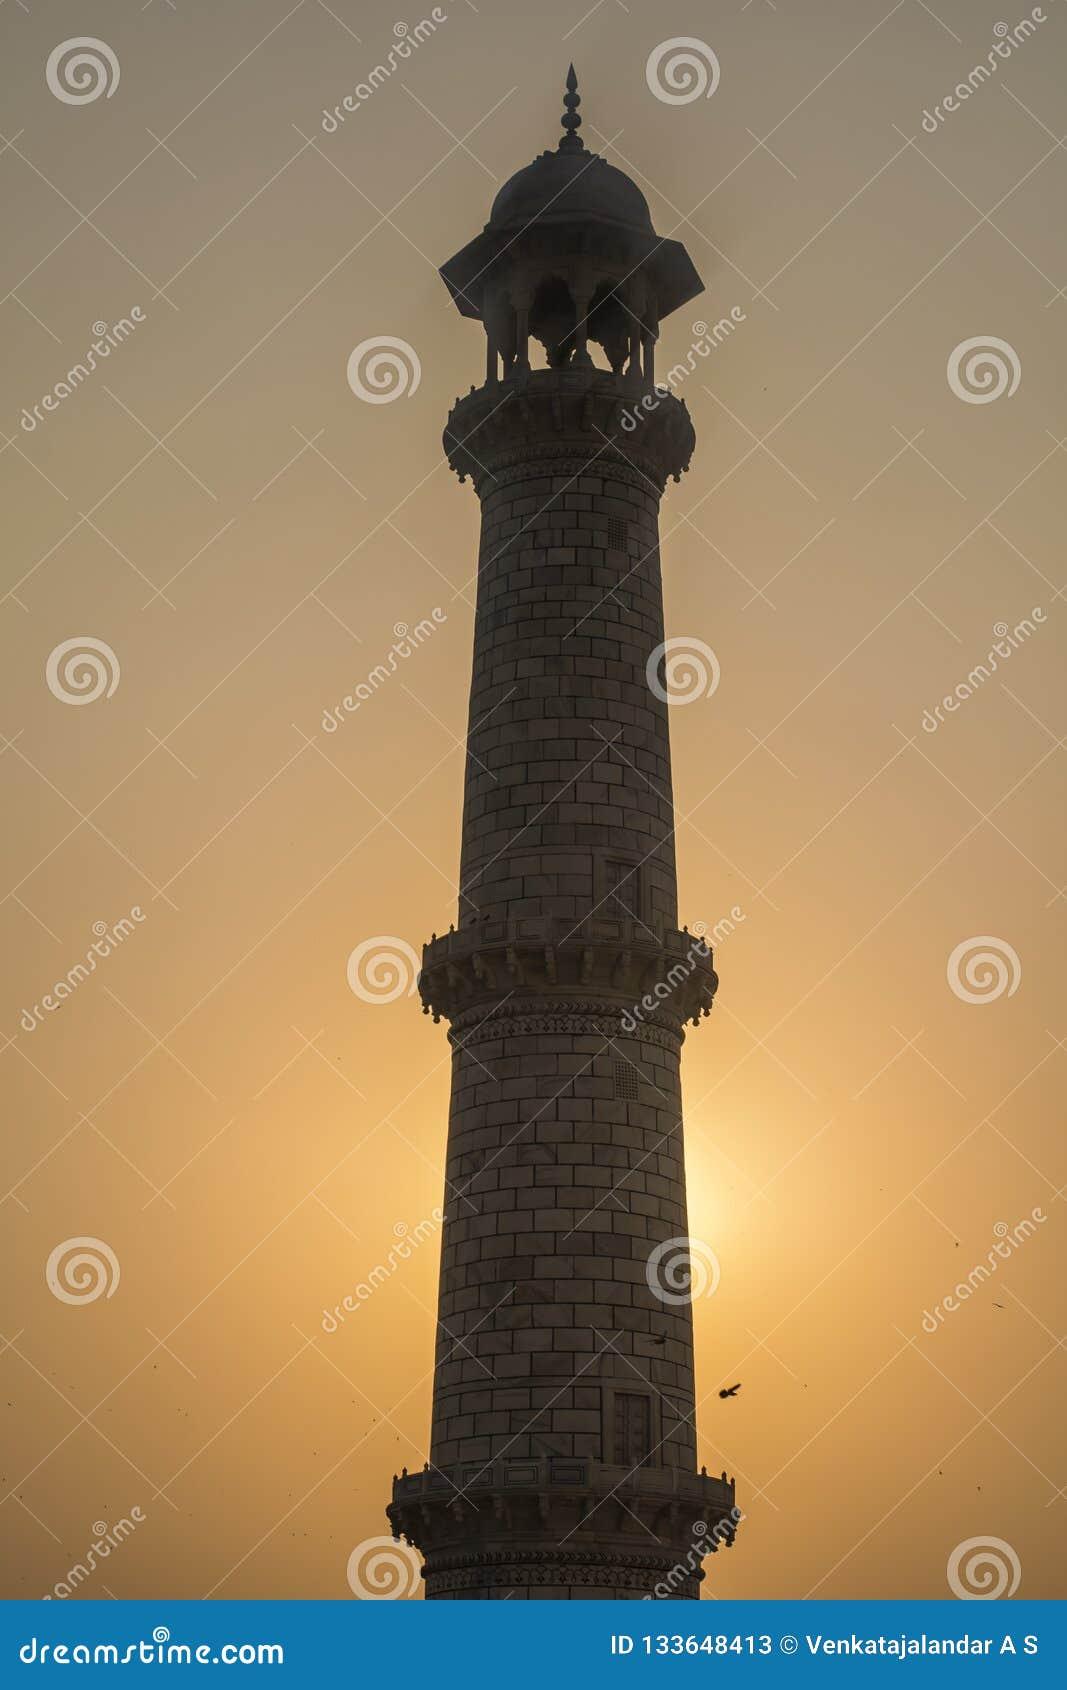 Pijler van Taj Mahal Silhoutte View, met erachter zonsondergang